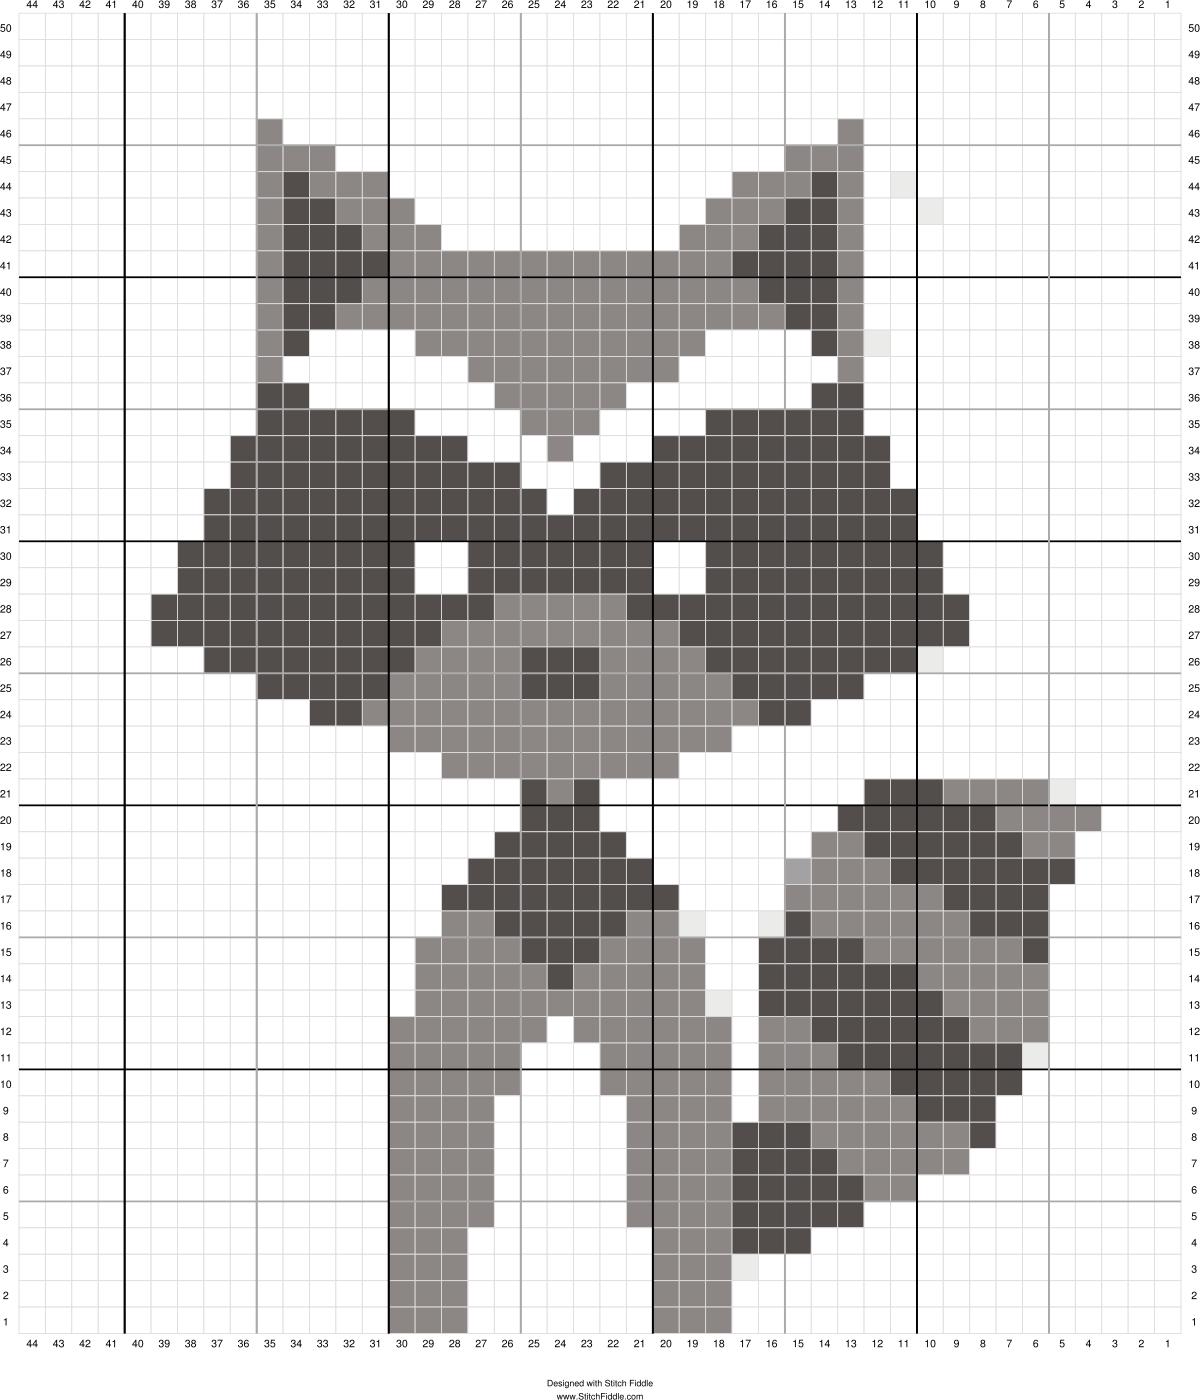 c2c crochet pattern - stitchfiddle.com   Crochet and Knit ...